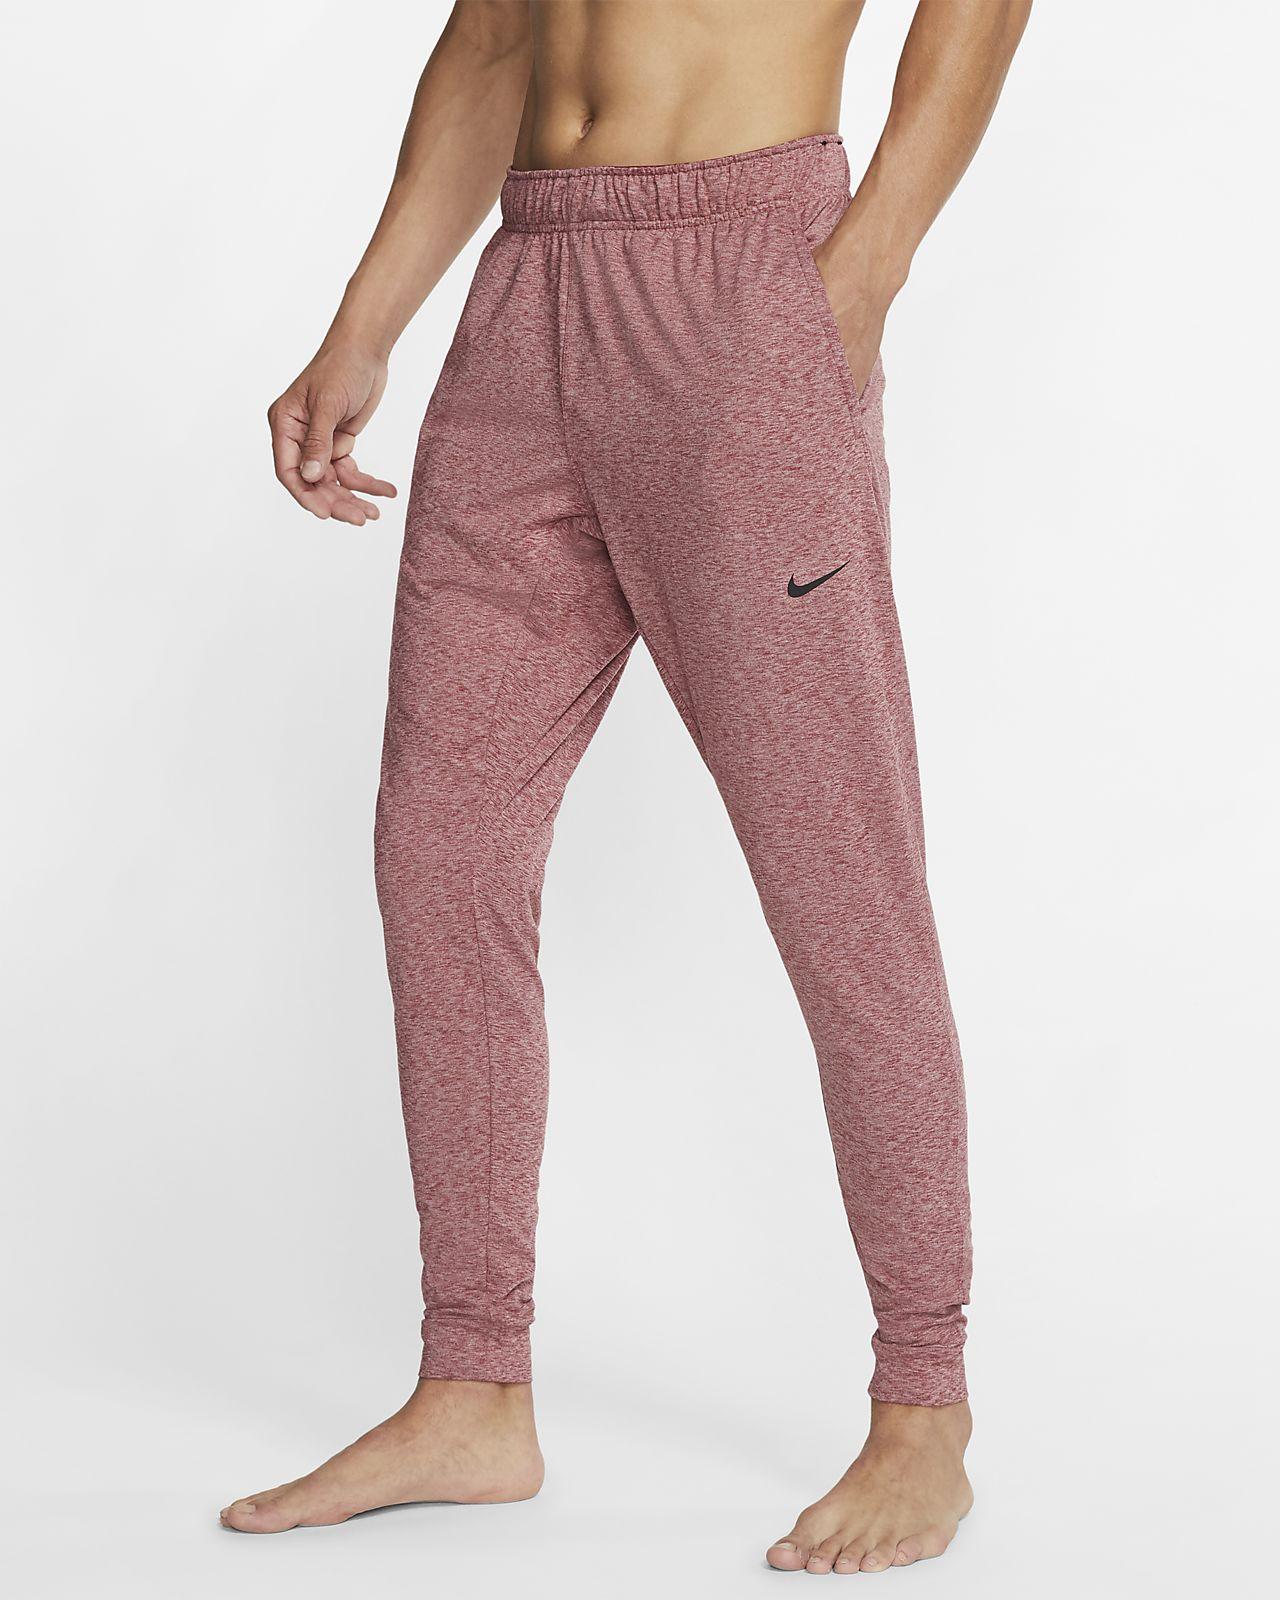 Pantaloni Nike Just Do It Inverno Uomo Tennis Warehouse Europe